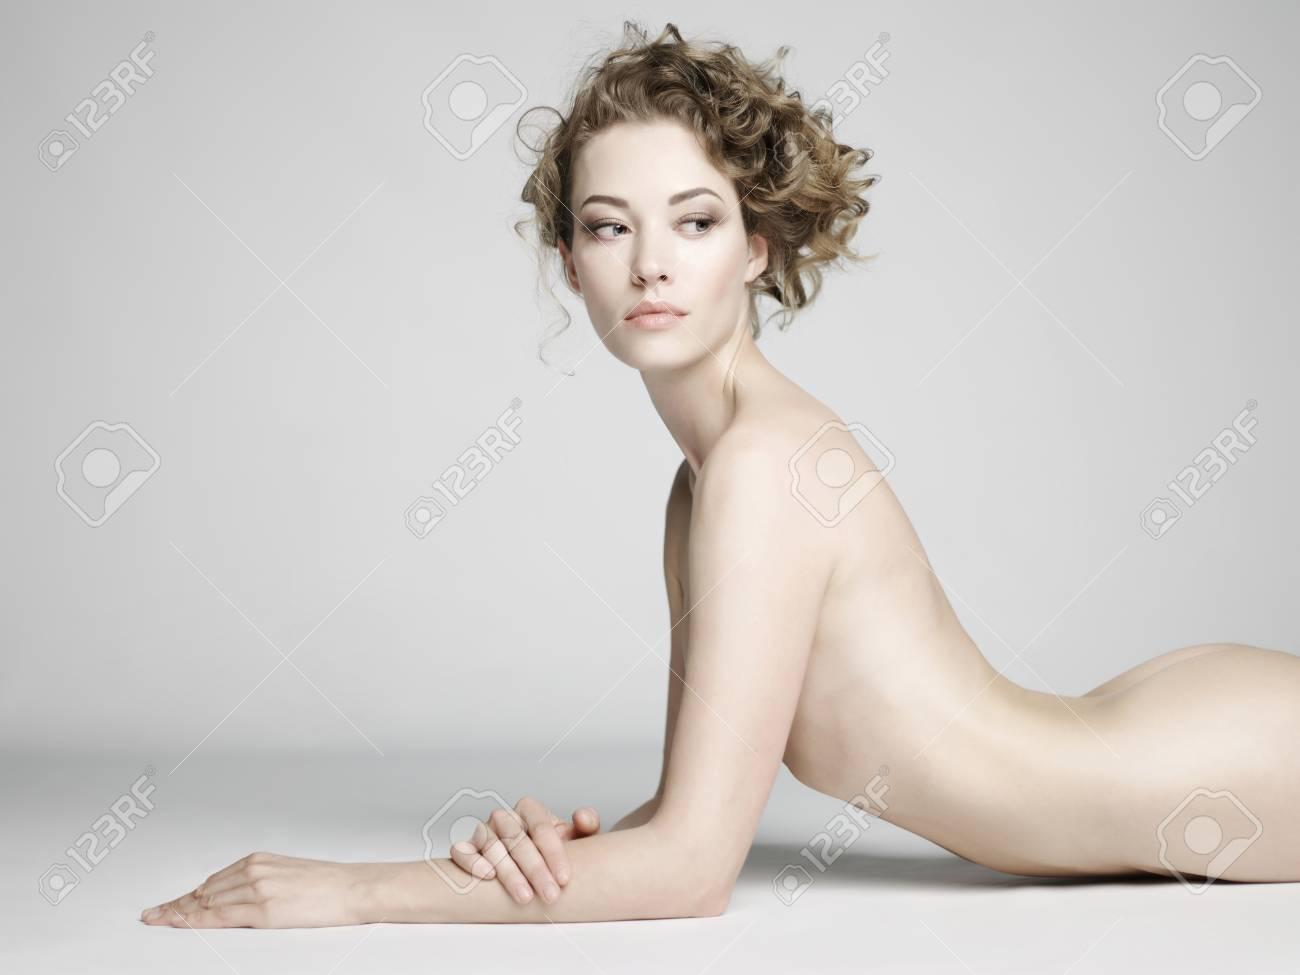 Erotic sex photographs women beautiful